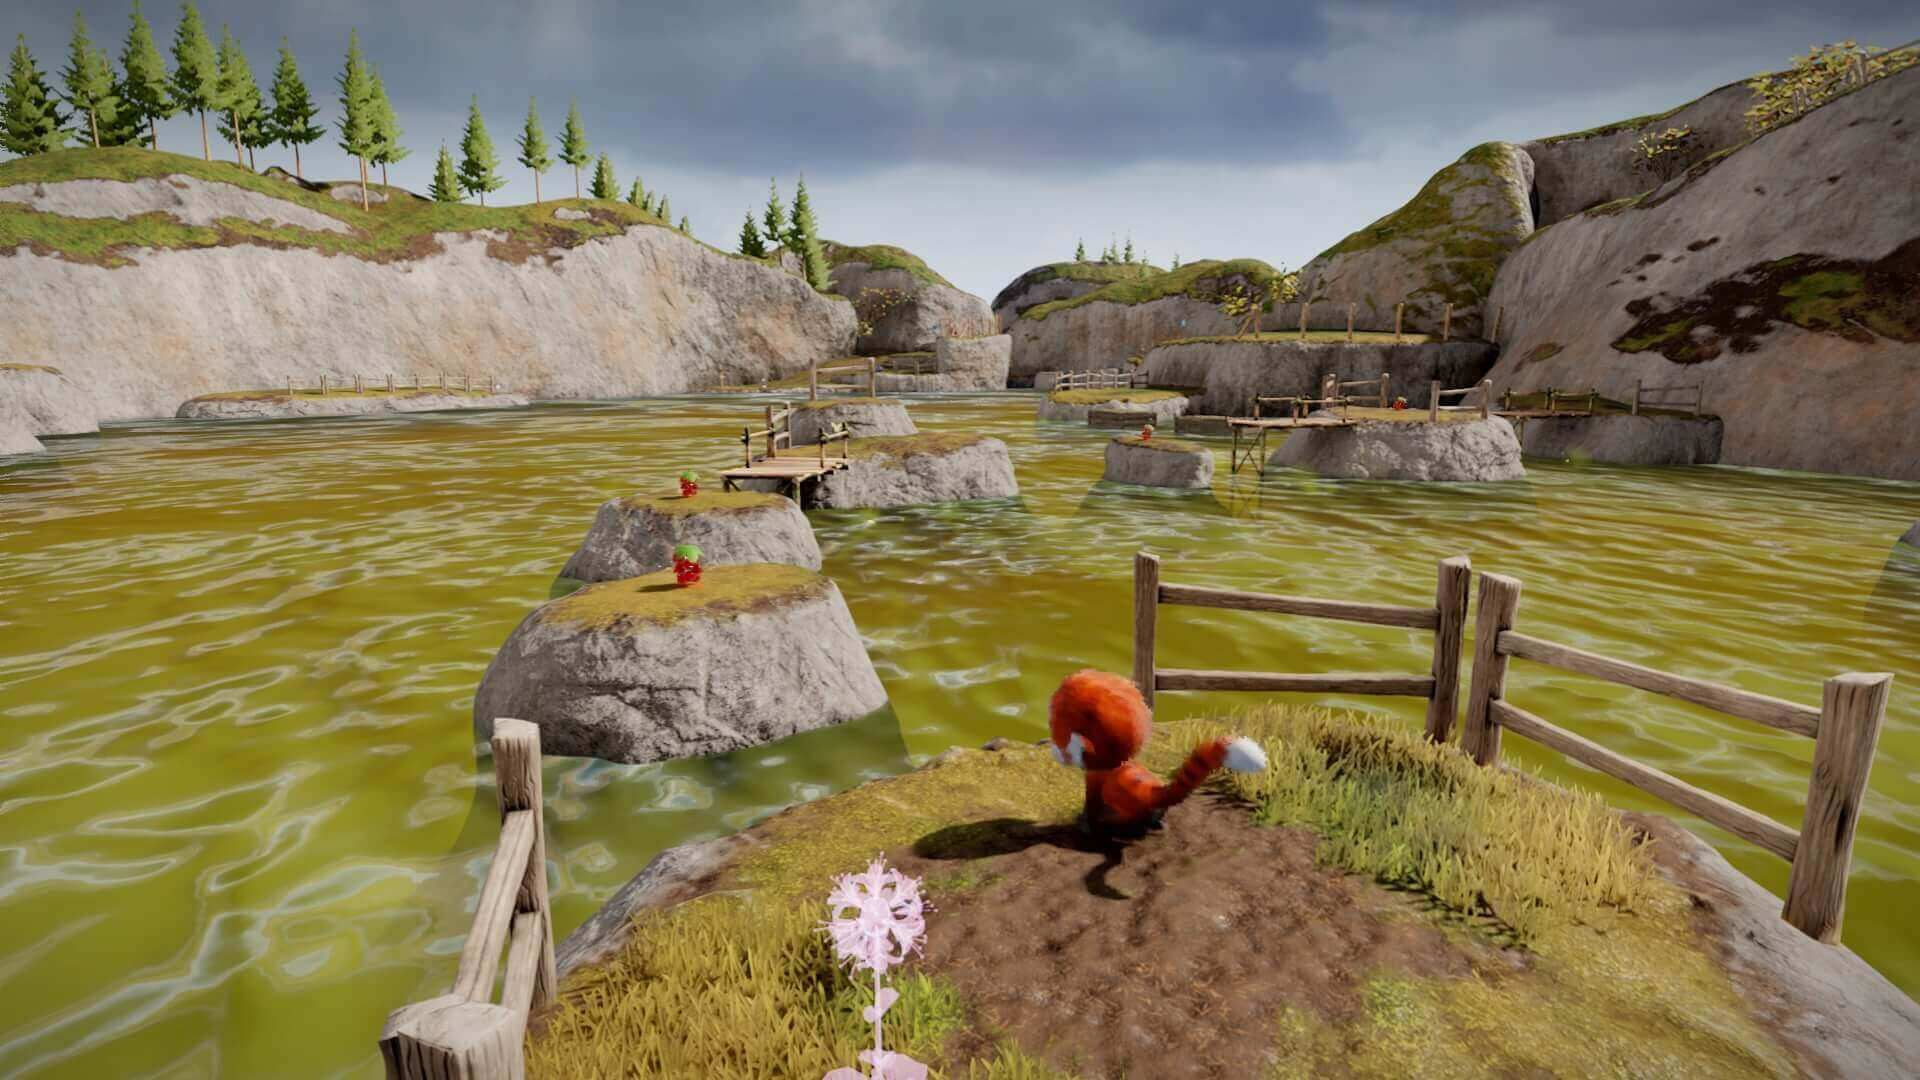 Análise Tamarin, Tamarin, Chameleon Games, Delfos